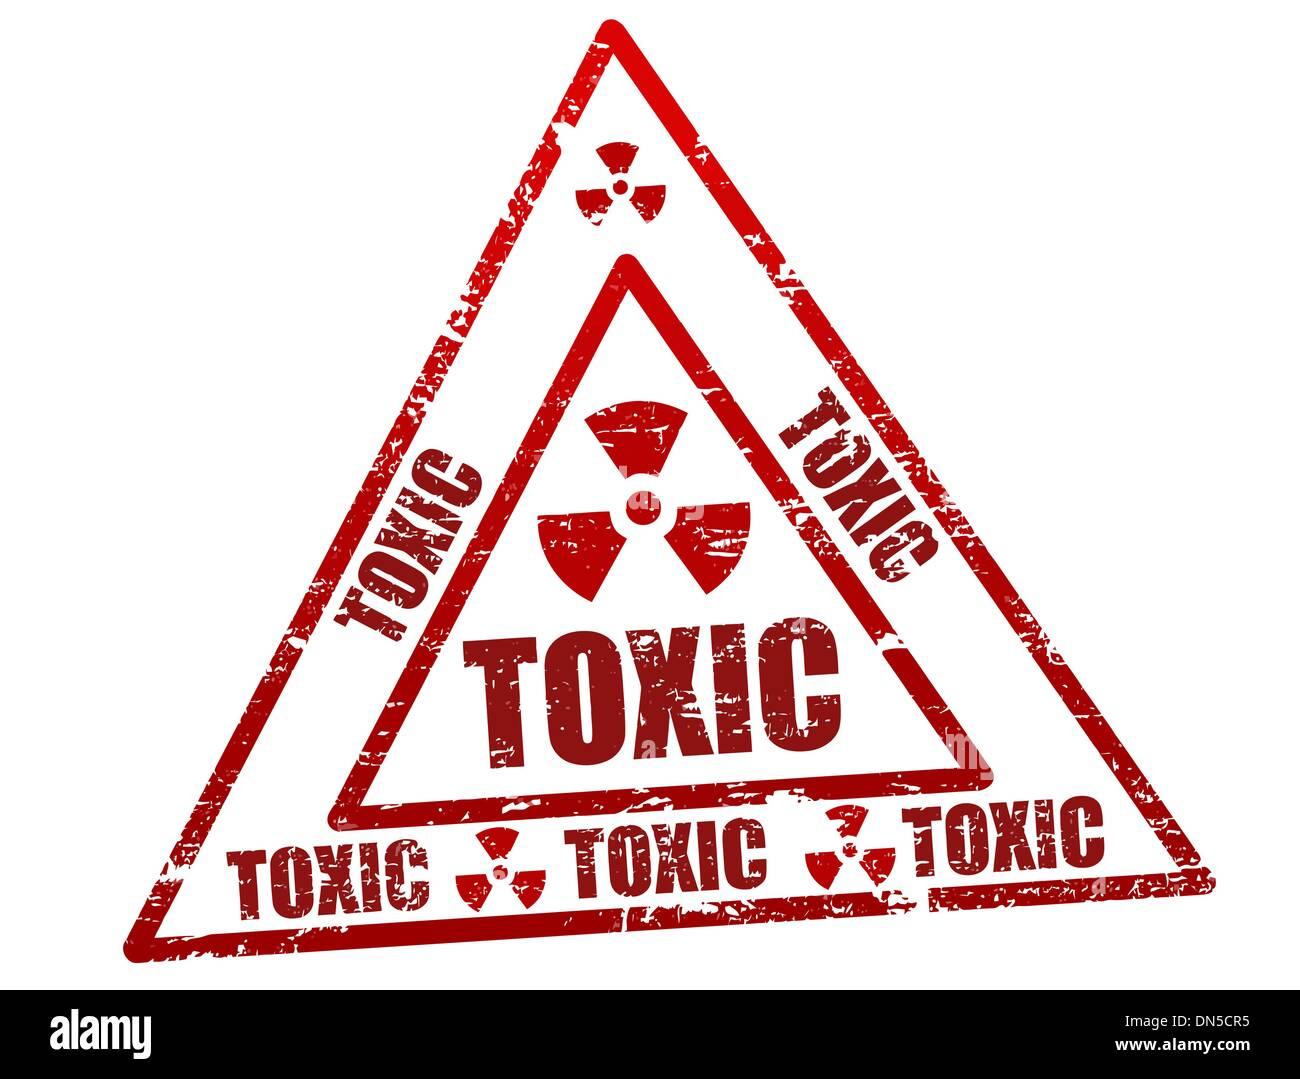 Toxic stamp - Stock Image